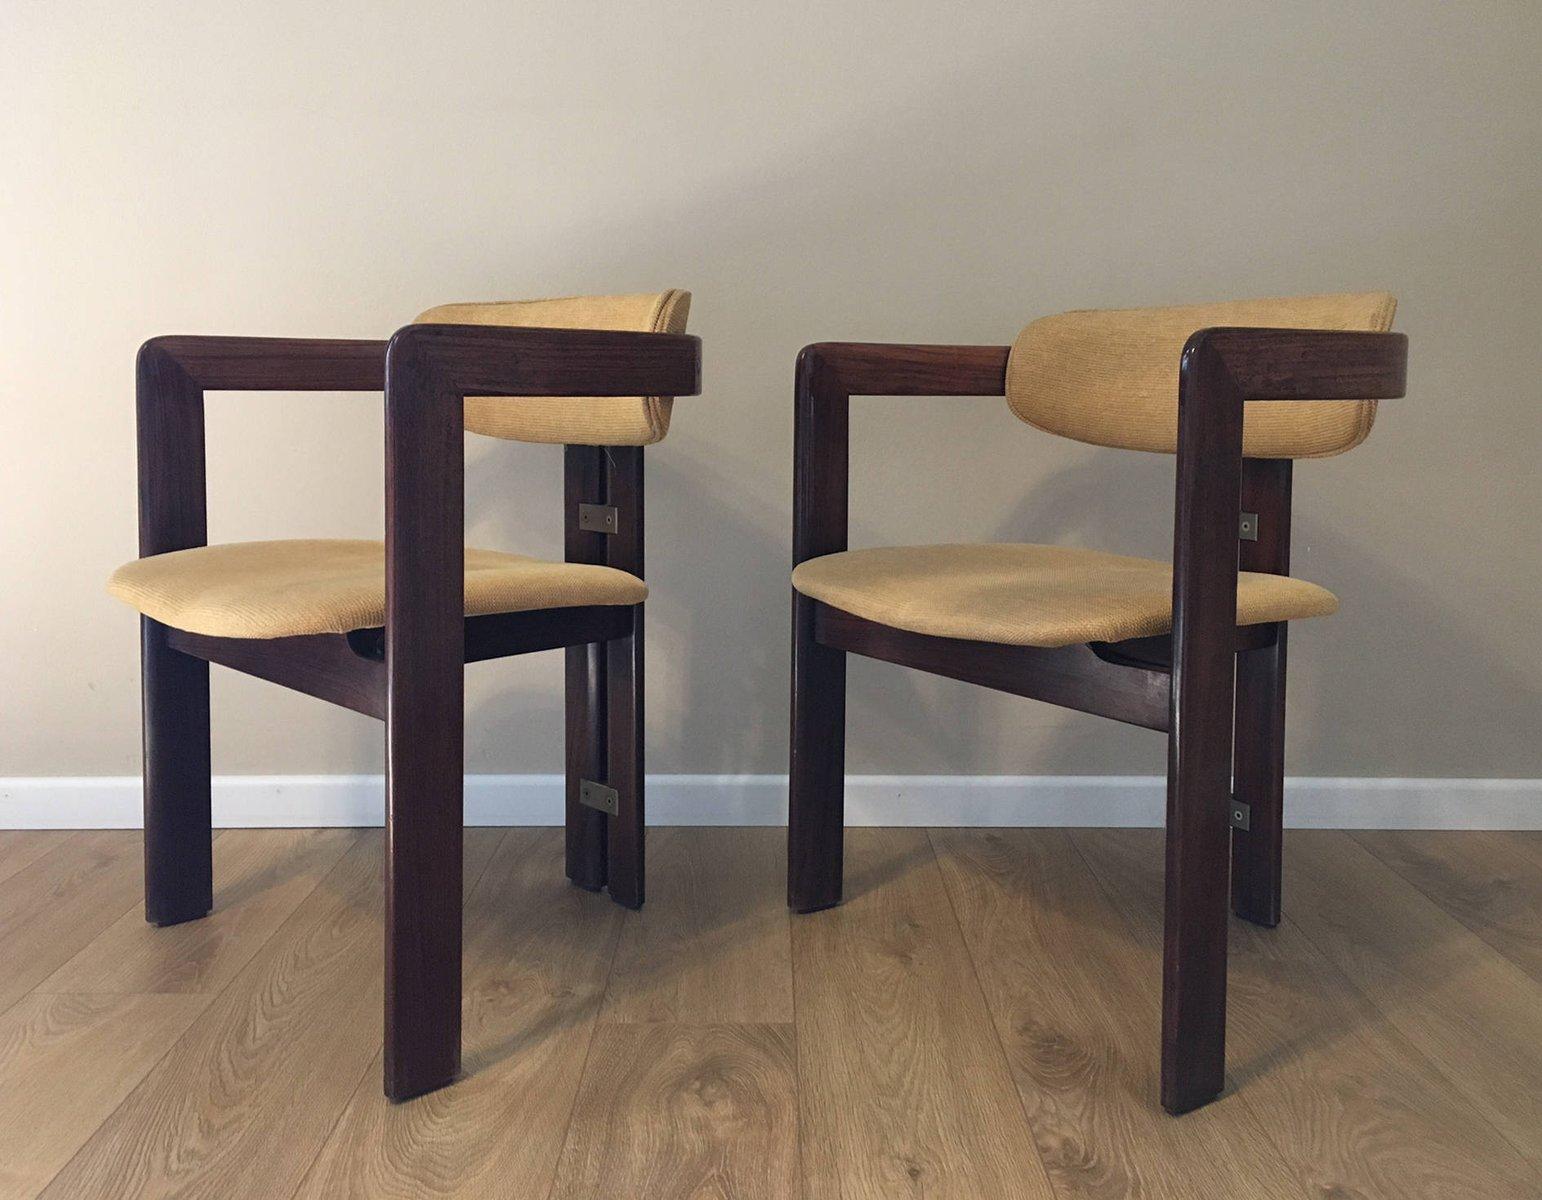 vintage pamplona st hle aus palisander von savini f r pozzi bei pamono kaufen. Black Bedroom Furniture Sets. Home Design Ideas